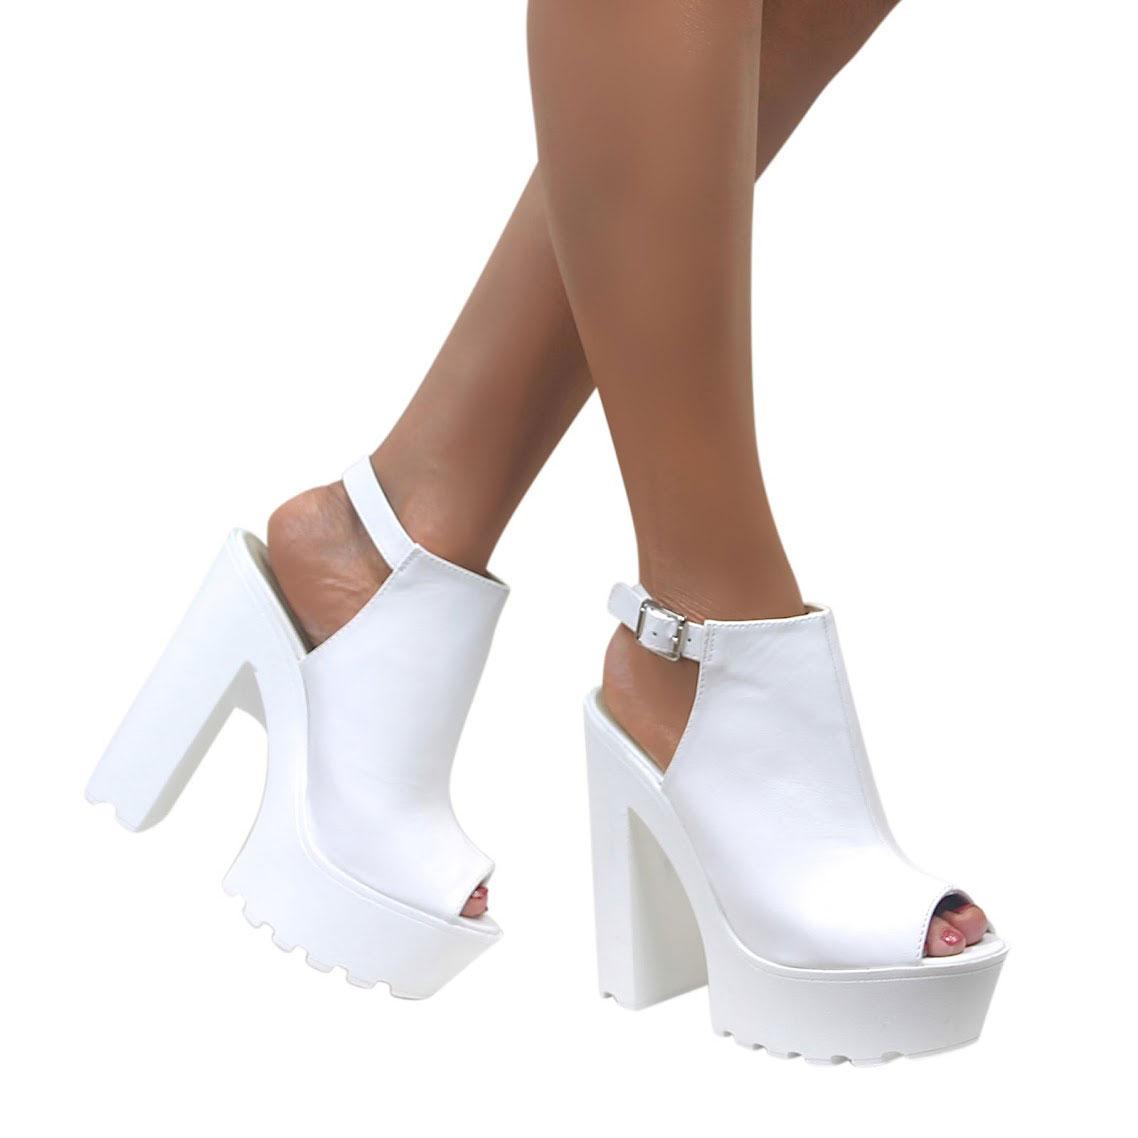 36105a834ad Chunky Cleated Sole Backless High Heels – Dahlia. Womens Chunky Heels - Qu  Heel